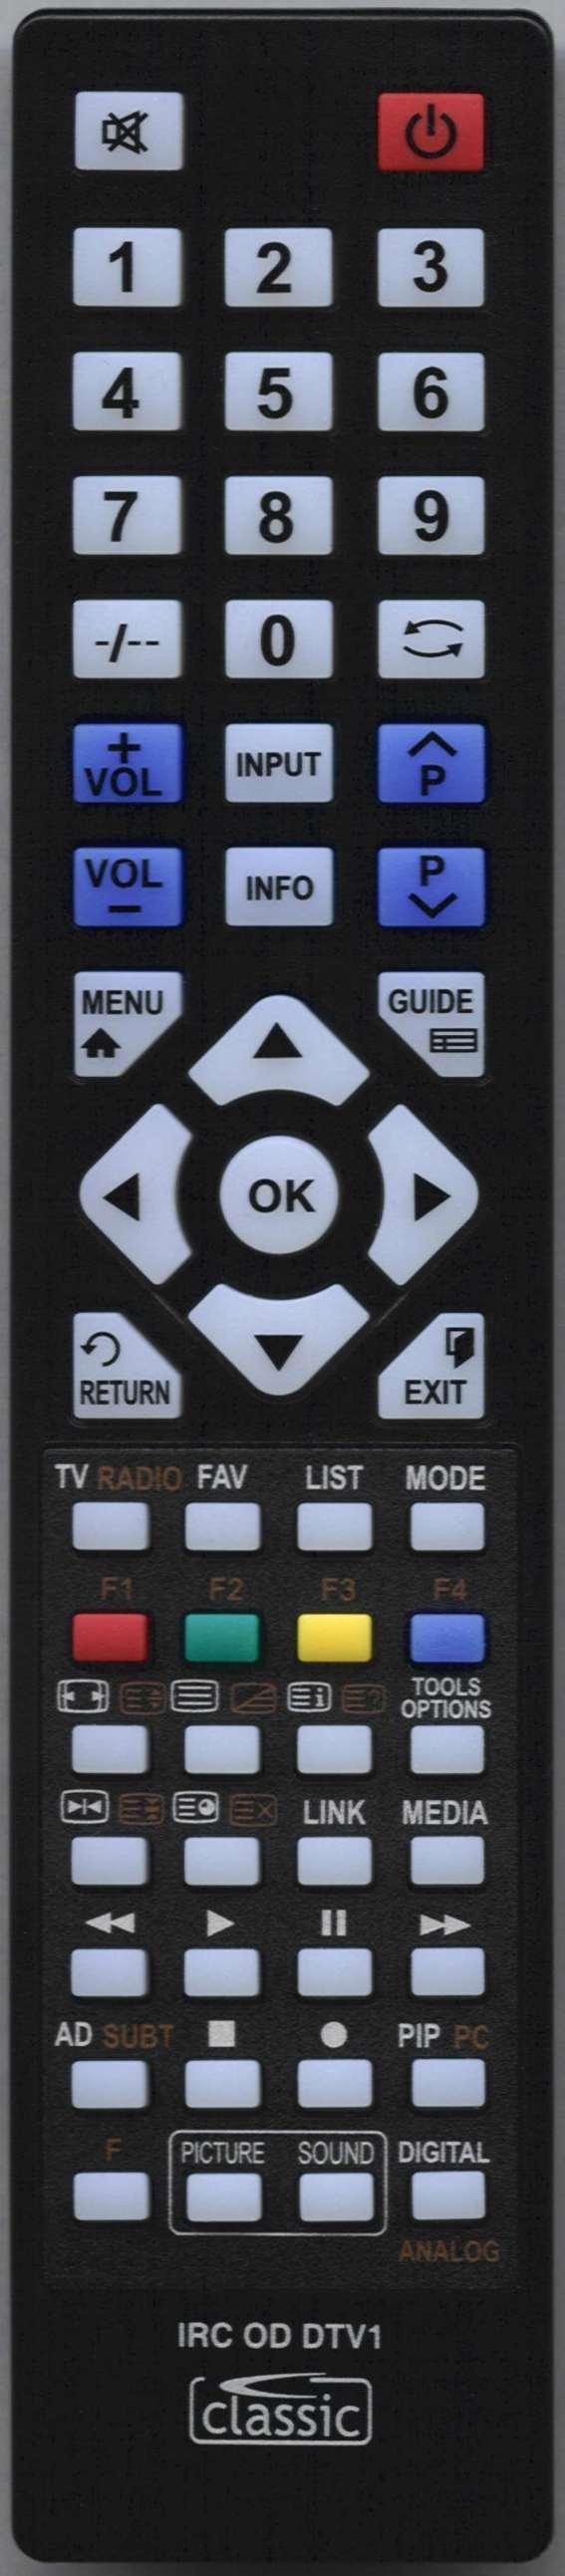 THOMSON 55UZ8766 Remote Control Alternative